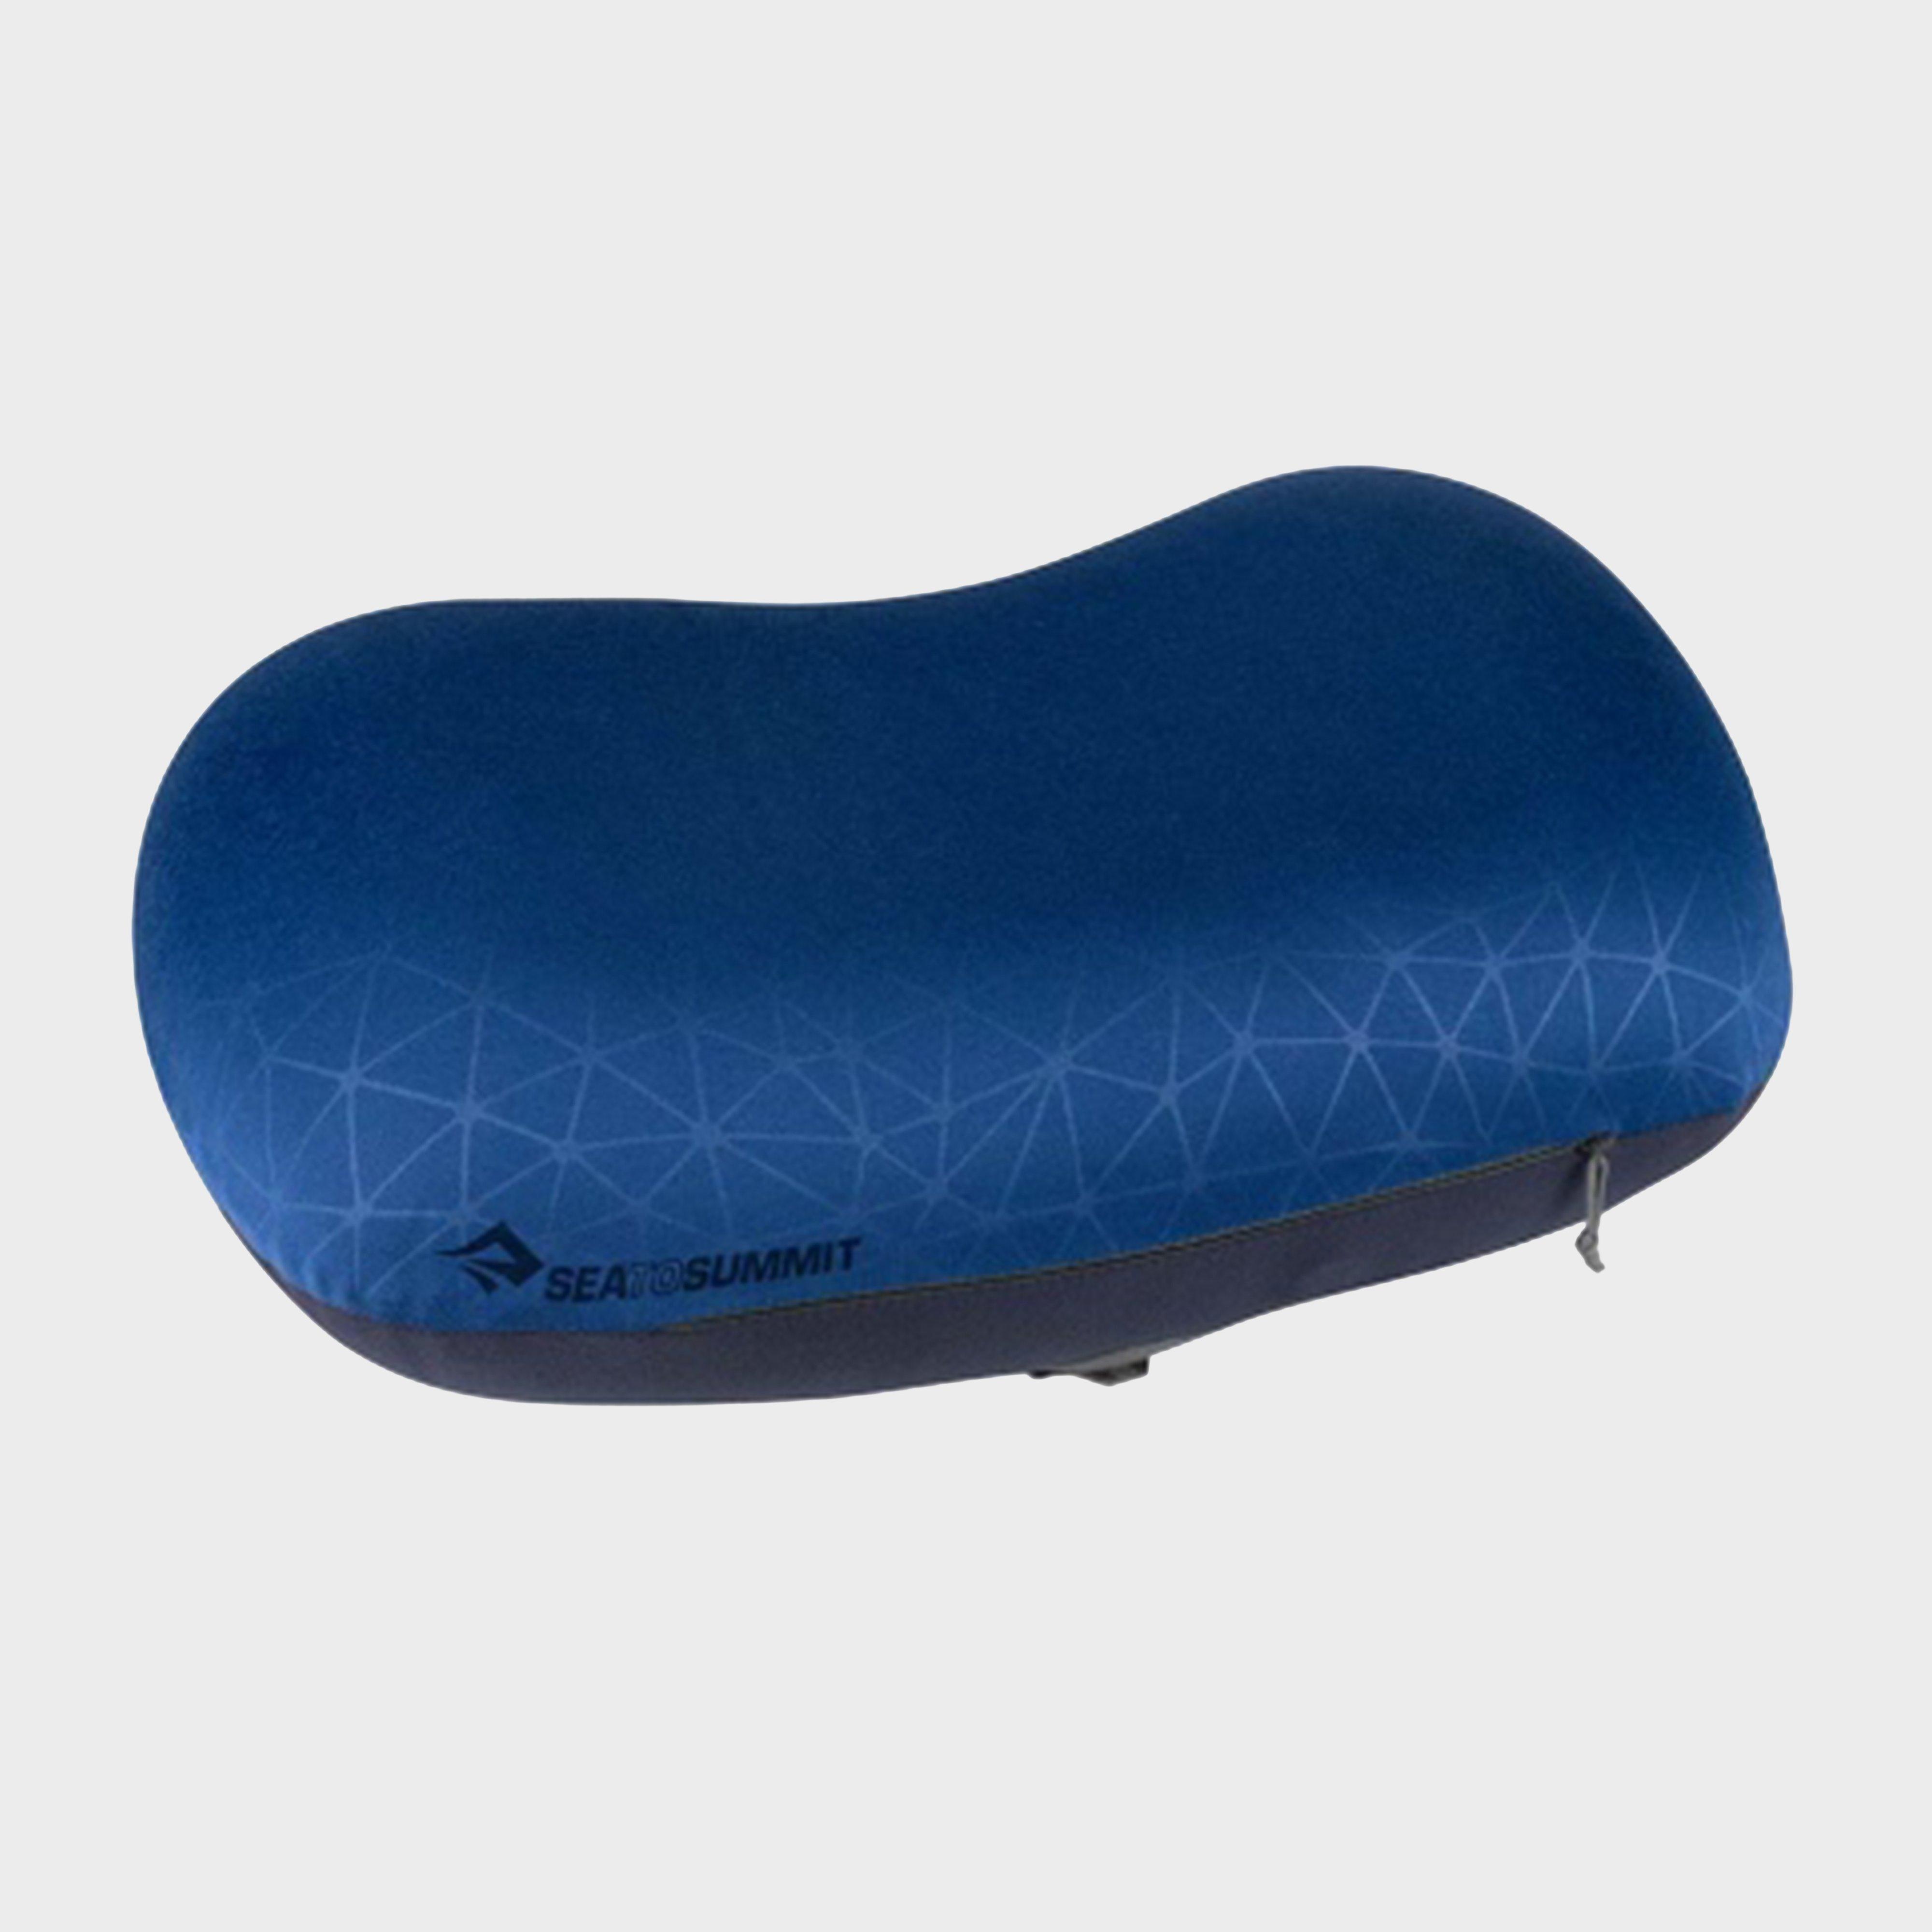 Sea to Summit Sea To Summit Aeros Pillow Case (Large)